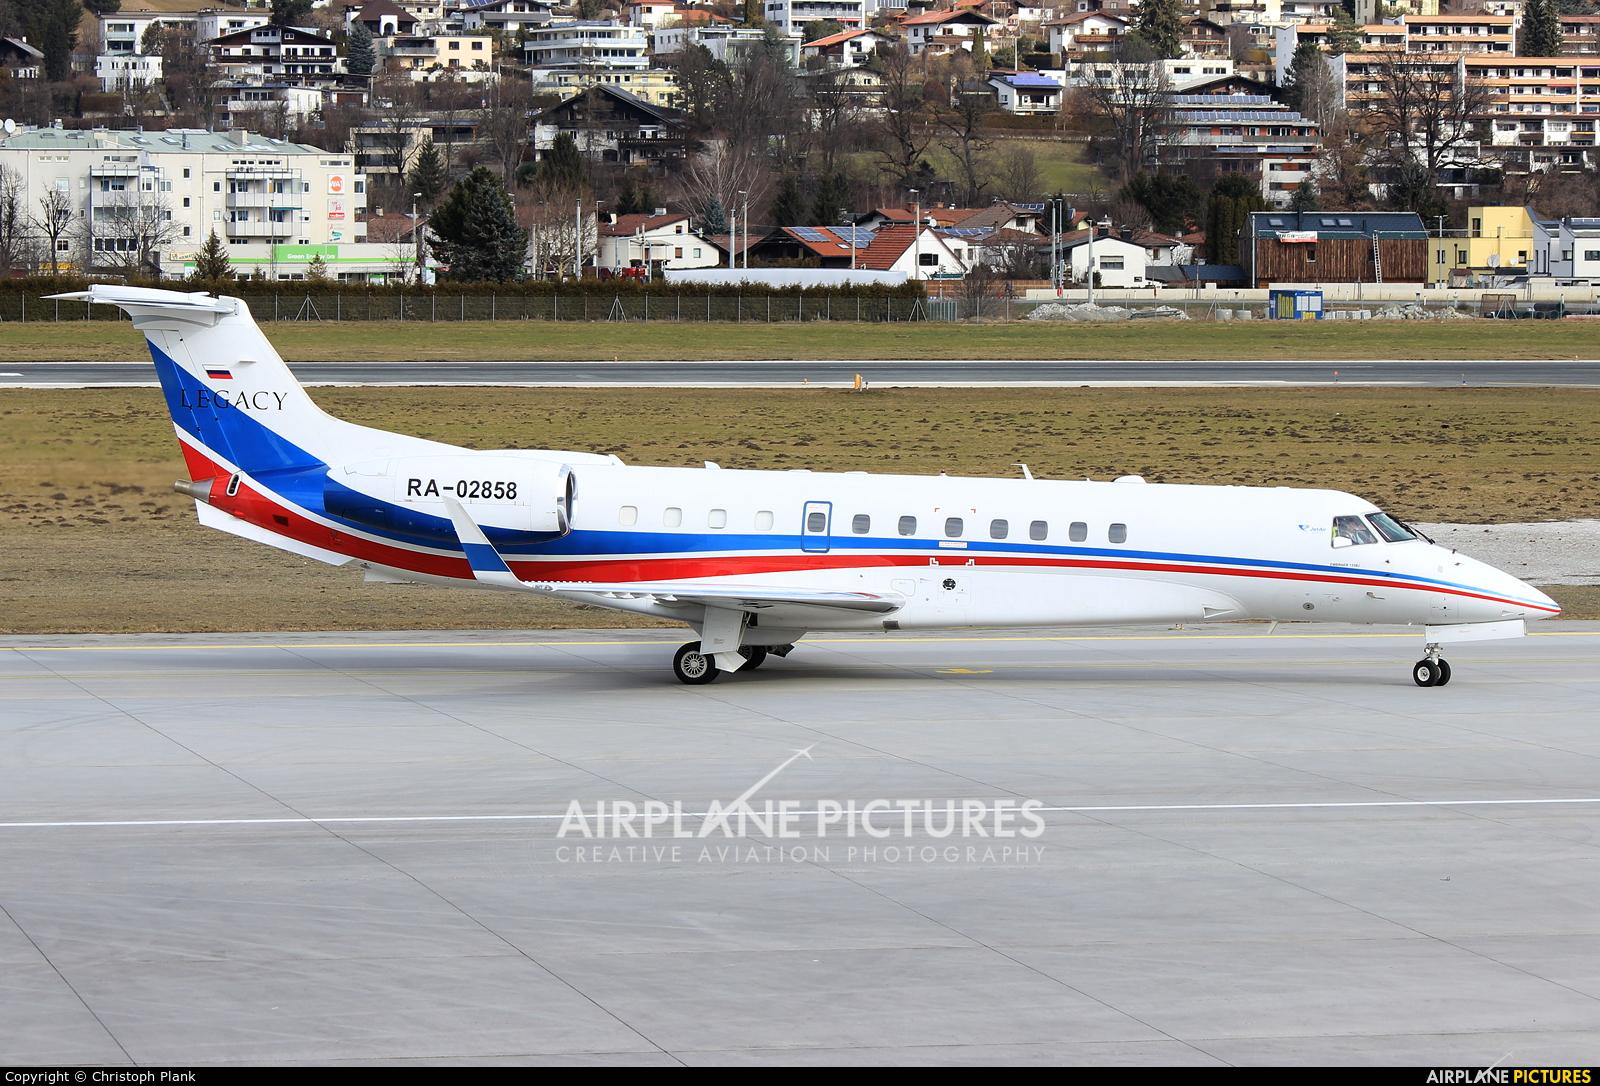 Jet Air Group (Russia) RA-02858 aircraft at Innsbruck